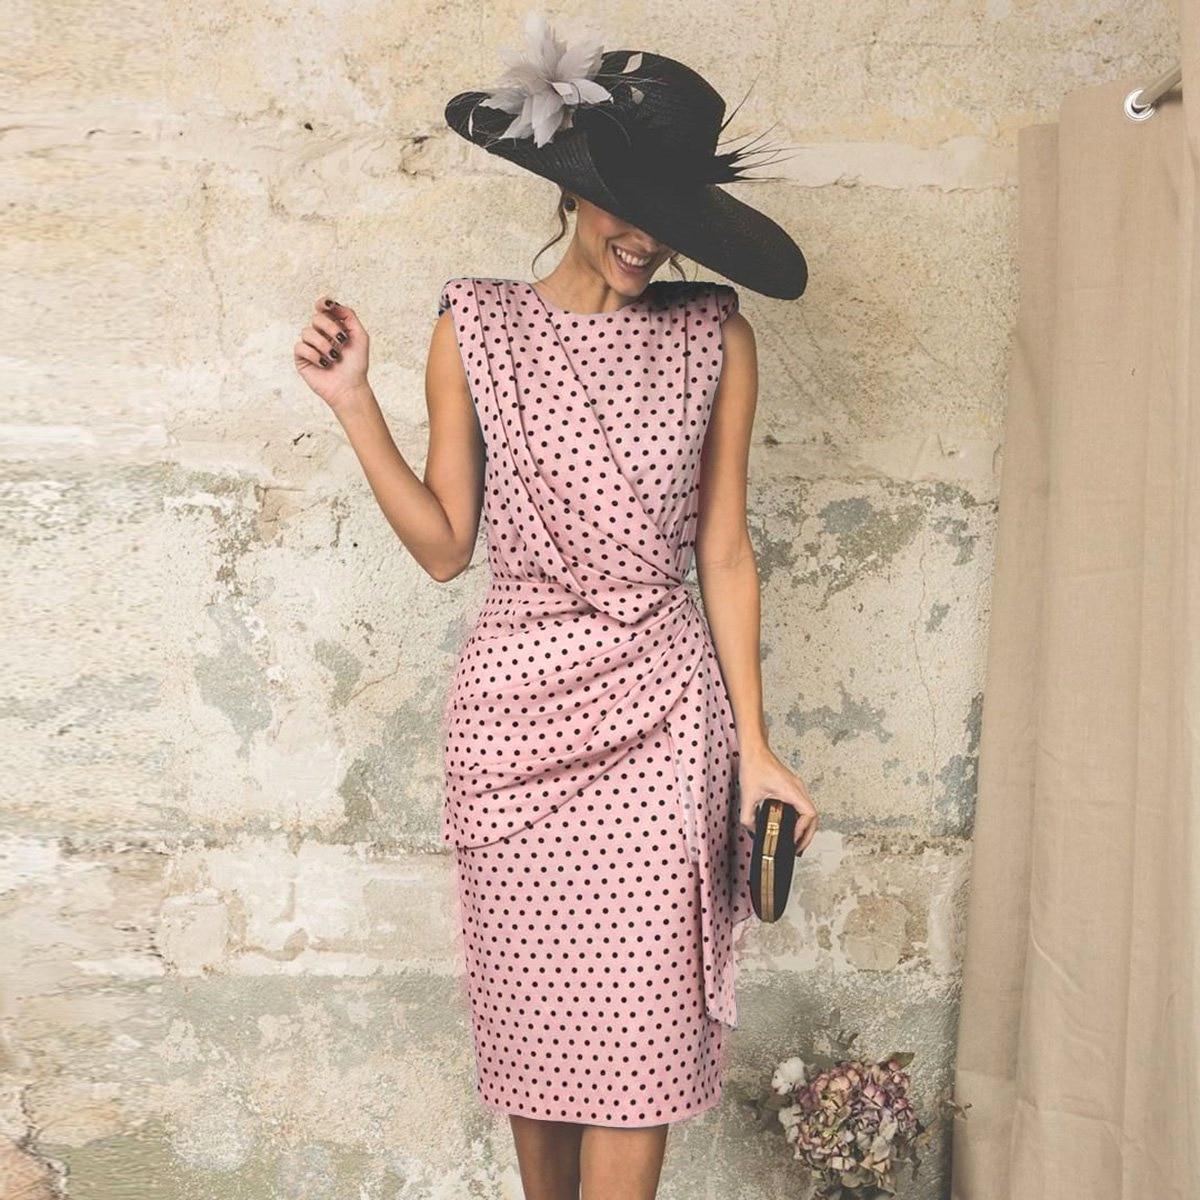 2020 Summer Plus Size Women Dress Short Sleeve O Neck Polka Dot Slim Cocktail Dress Sexy Midi Bodycon Party Dresses Vestido